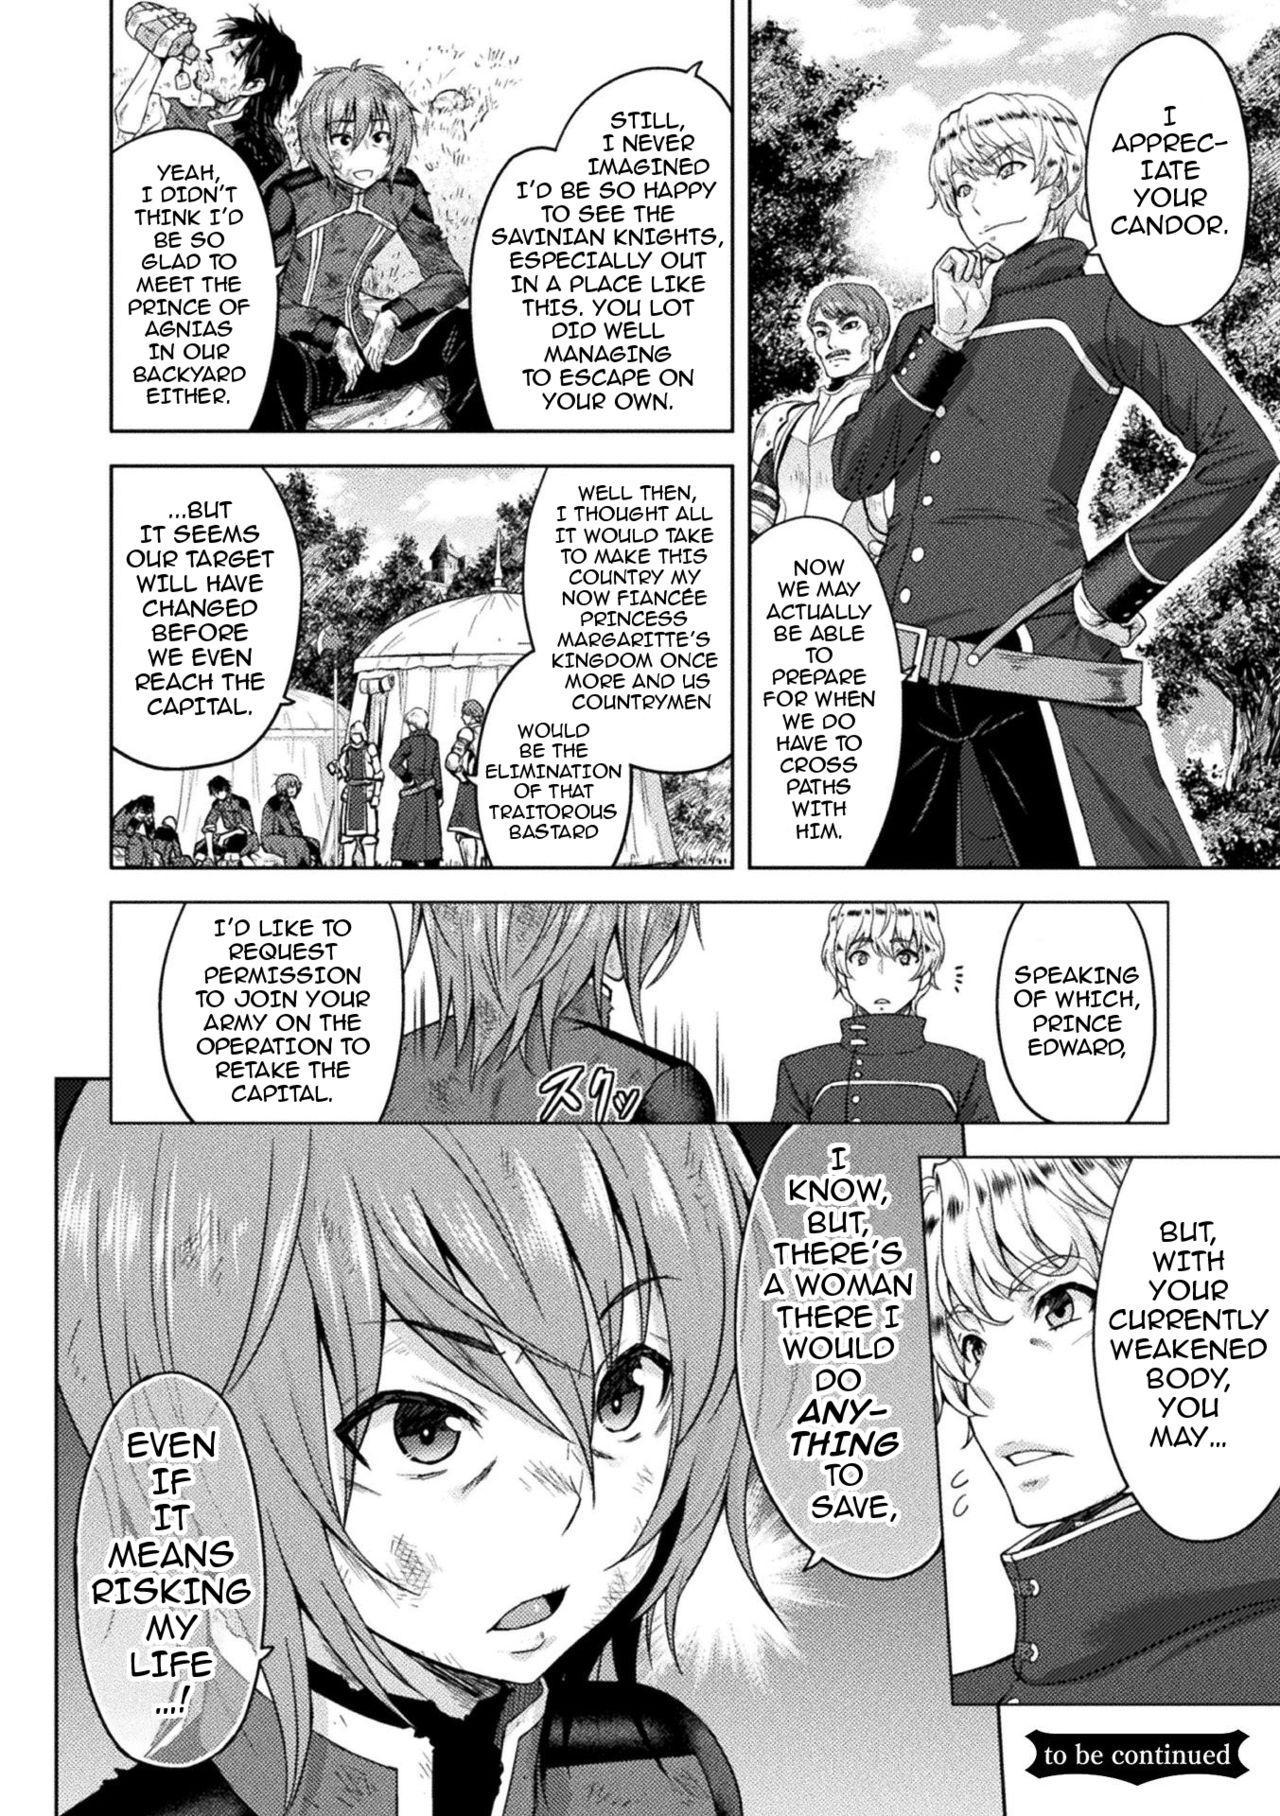 [Yamada Gogogo] Erona ~Orc no Inmon ni Okasareta Onna Kishi no Matsuro~   Erona ~The Fall of a Beautiful Knight Cursed with the Lewd Mark of an Orc~ Ch. 1-6 [English] {darknight} 100